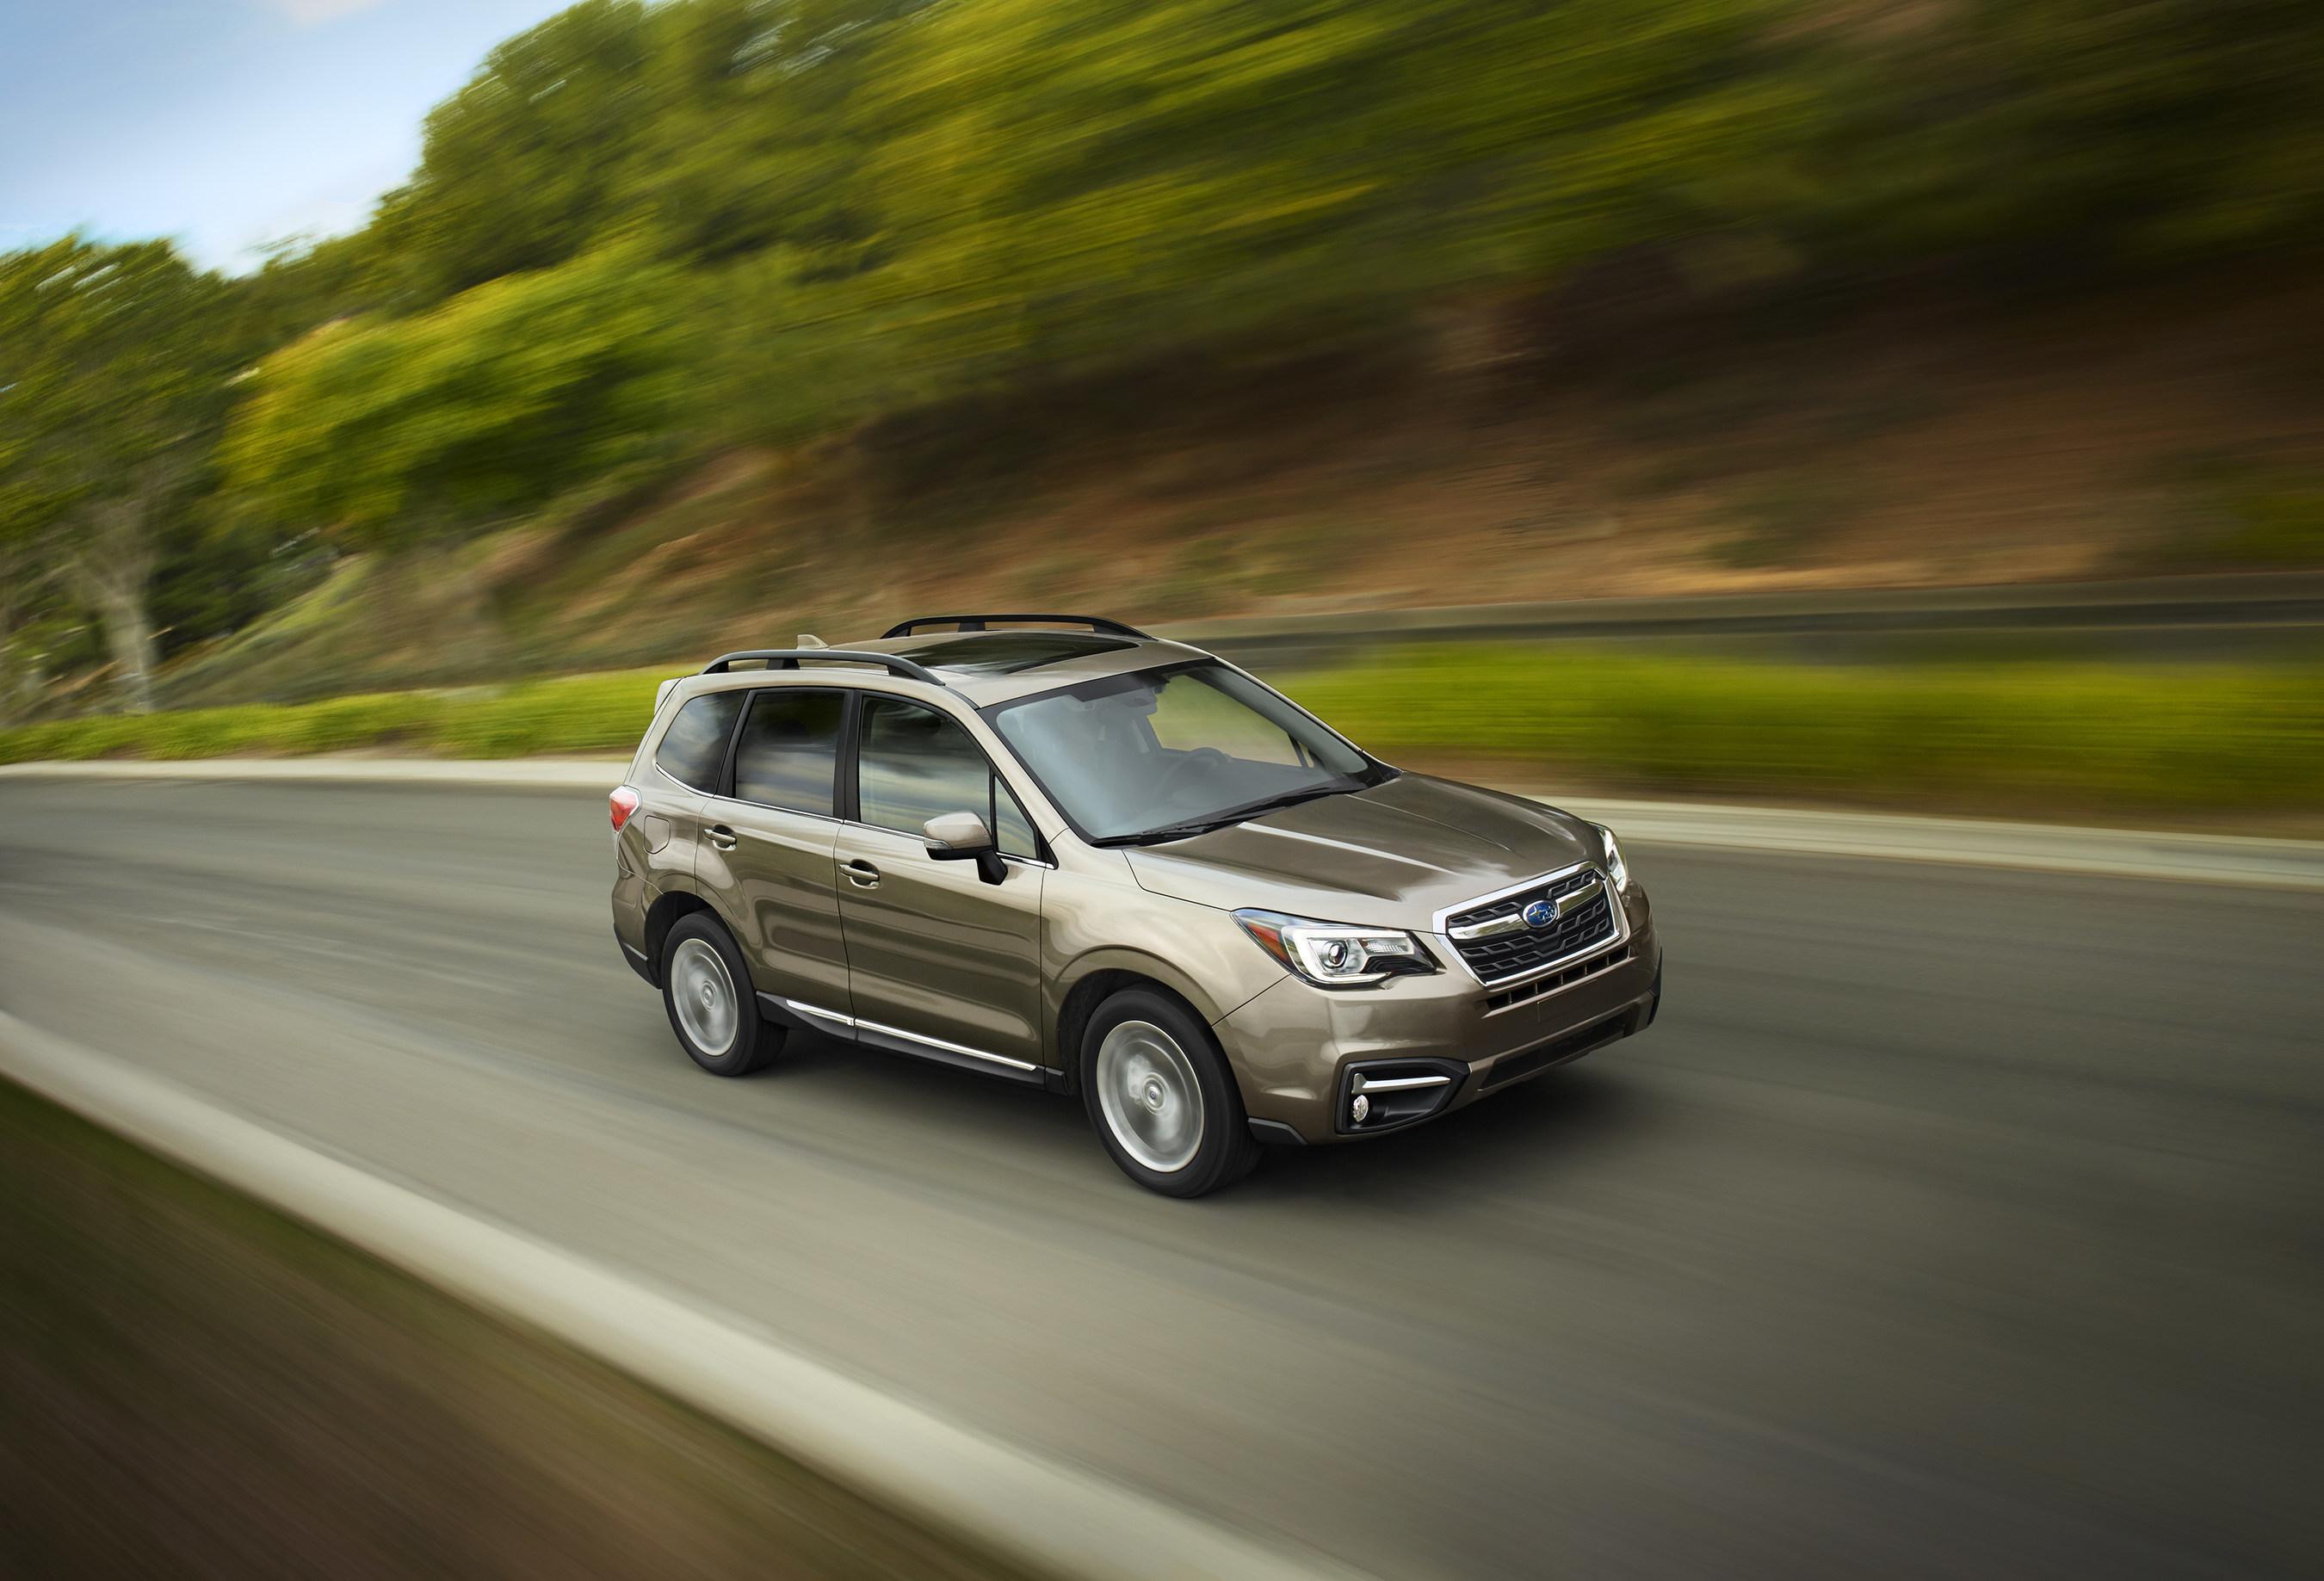 2017 Subaru Forester Offers Advanced